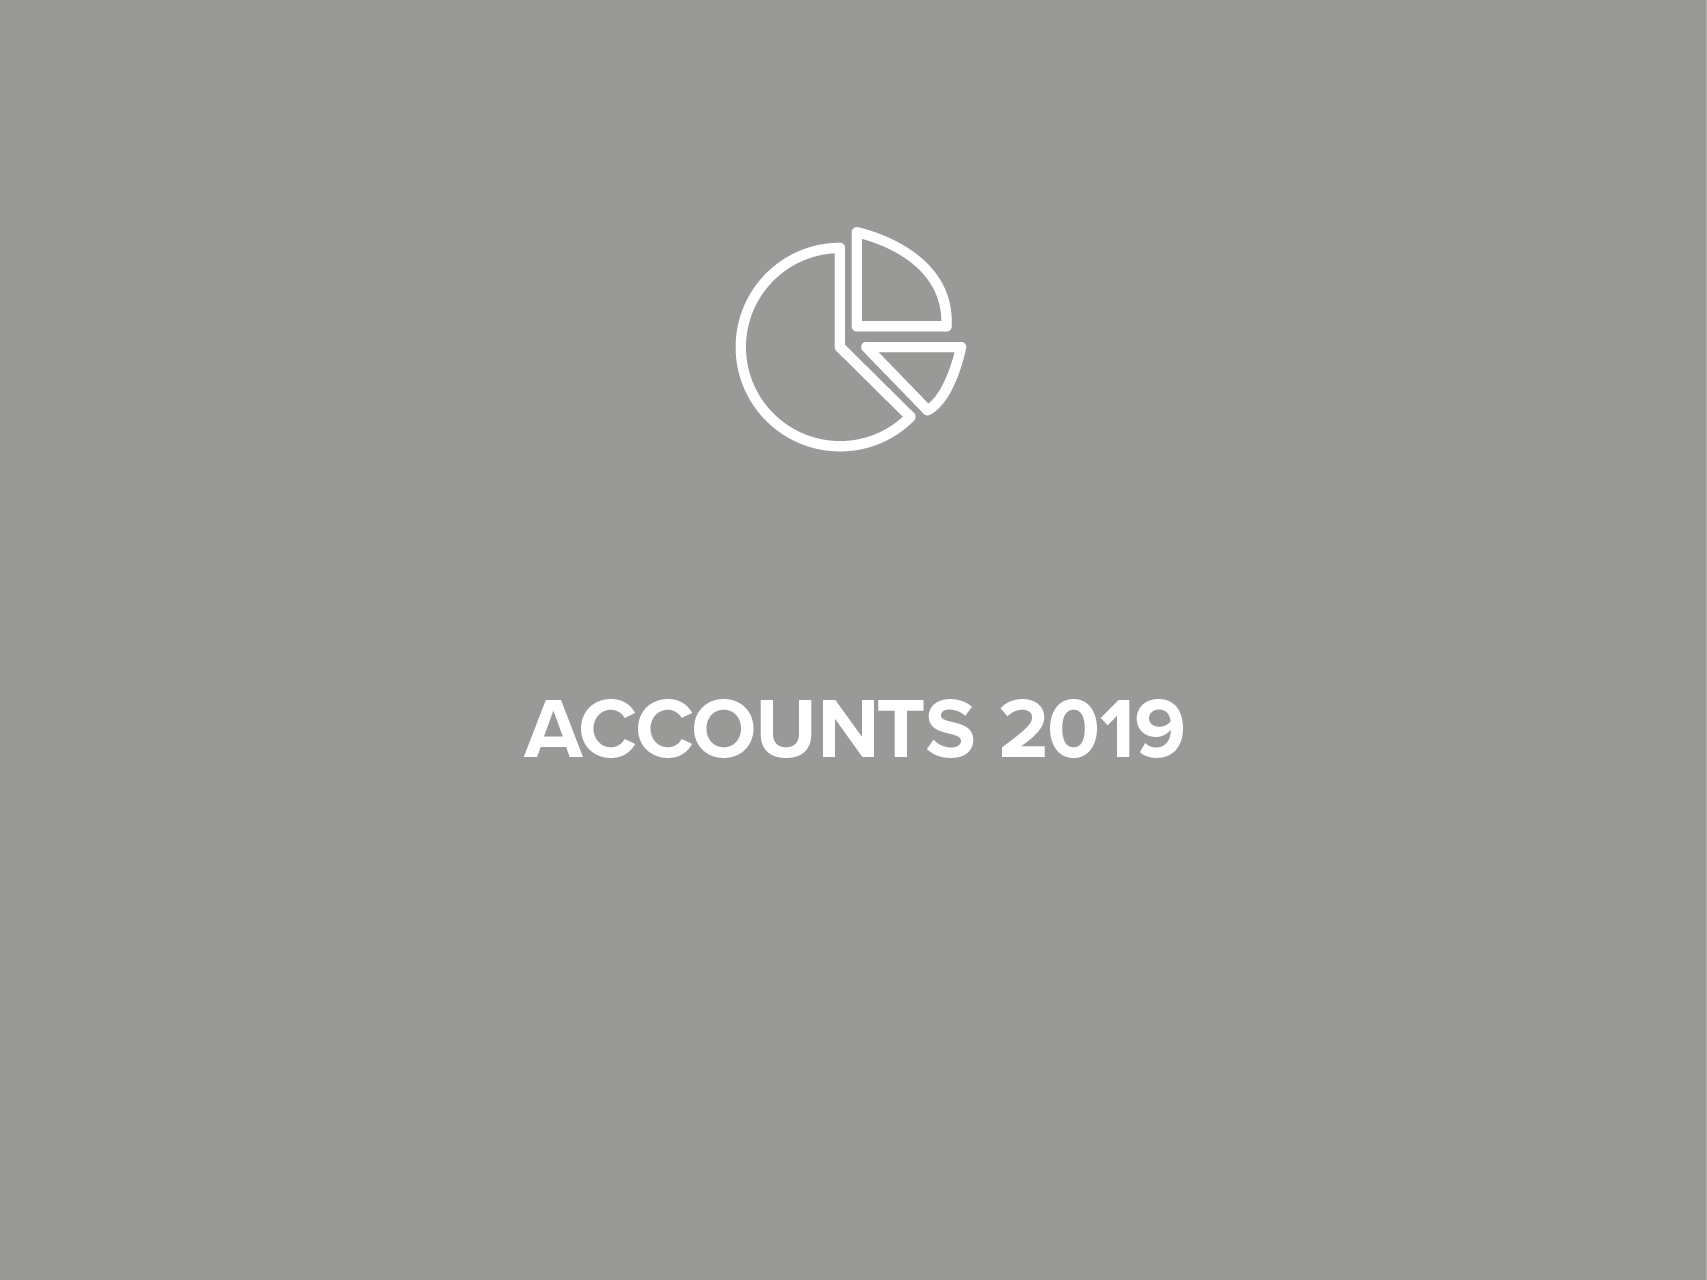 Accounts 2019